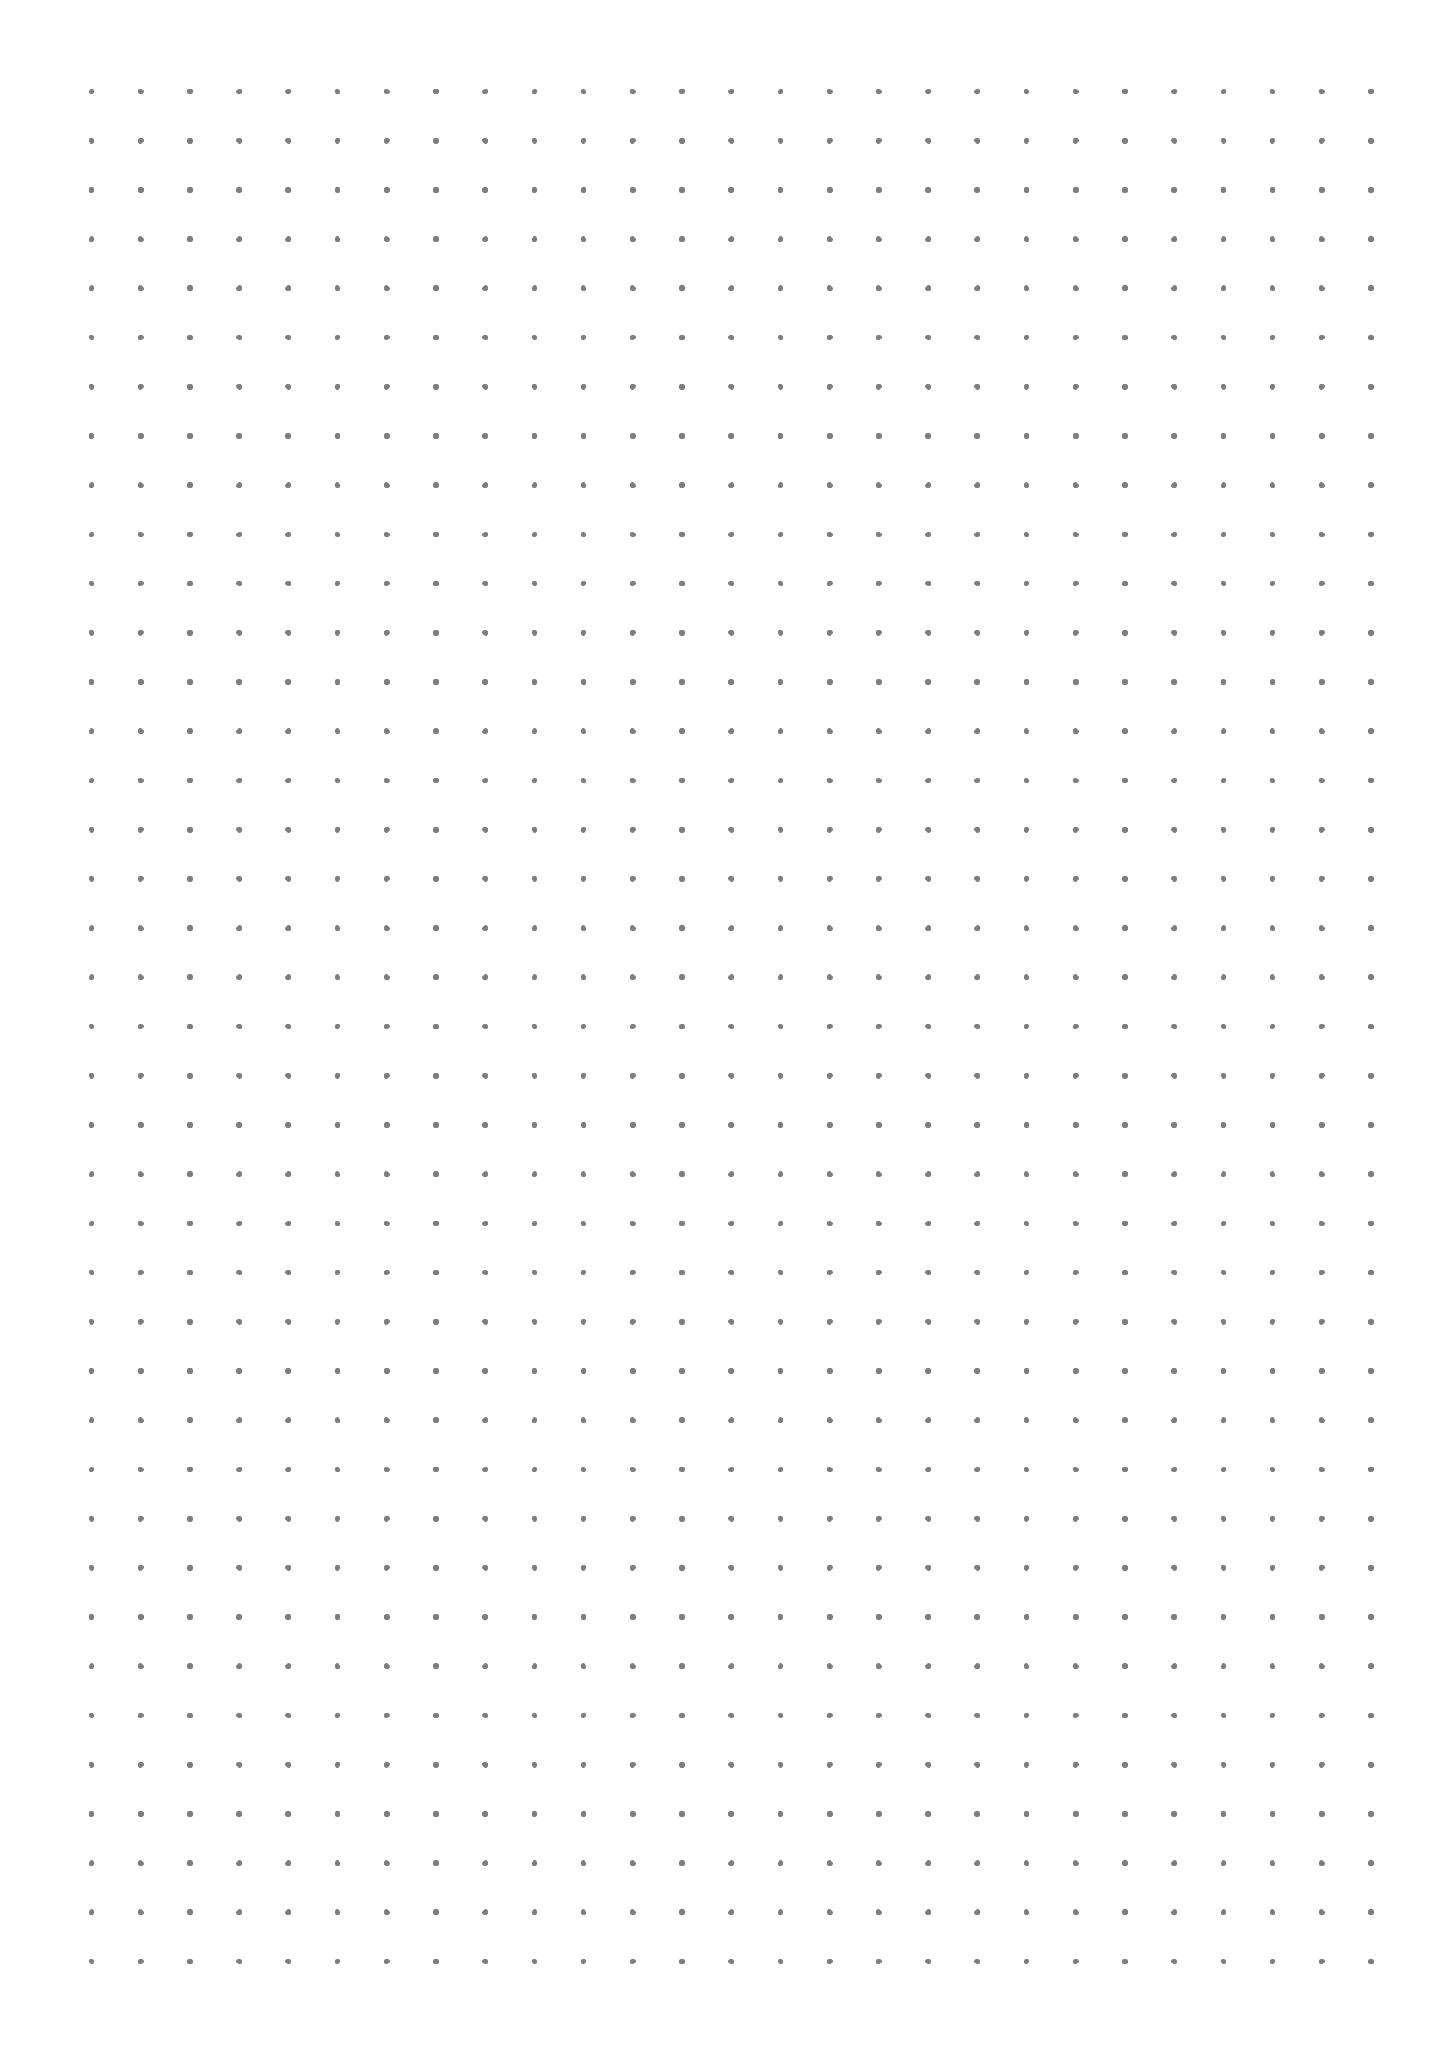 Printable Dot Grid Paper With 5 Mm Spacing Pdf Download Bullet Journal Dot Grid Bullet Journal Paper Printable Graph Paper